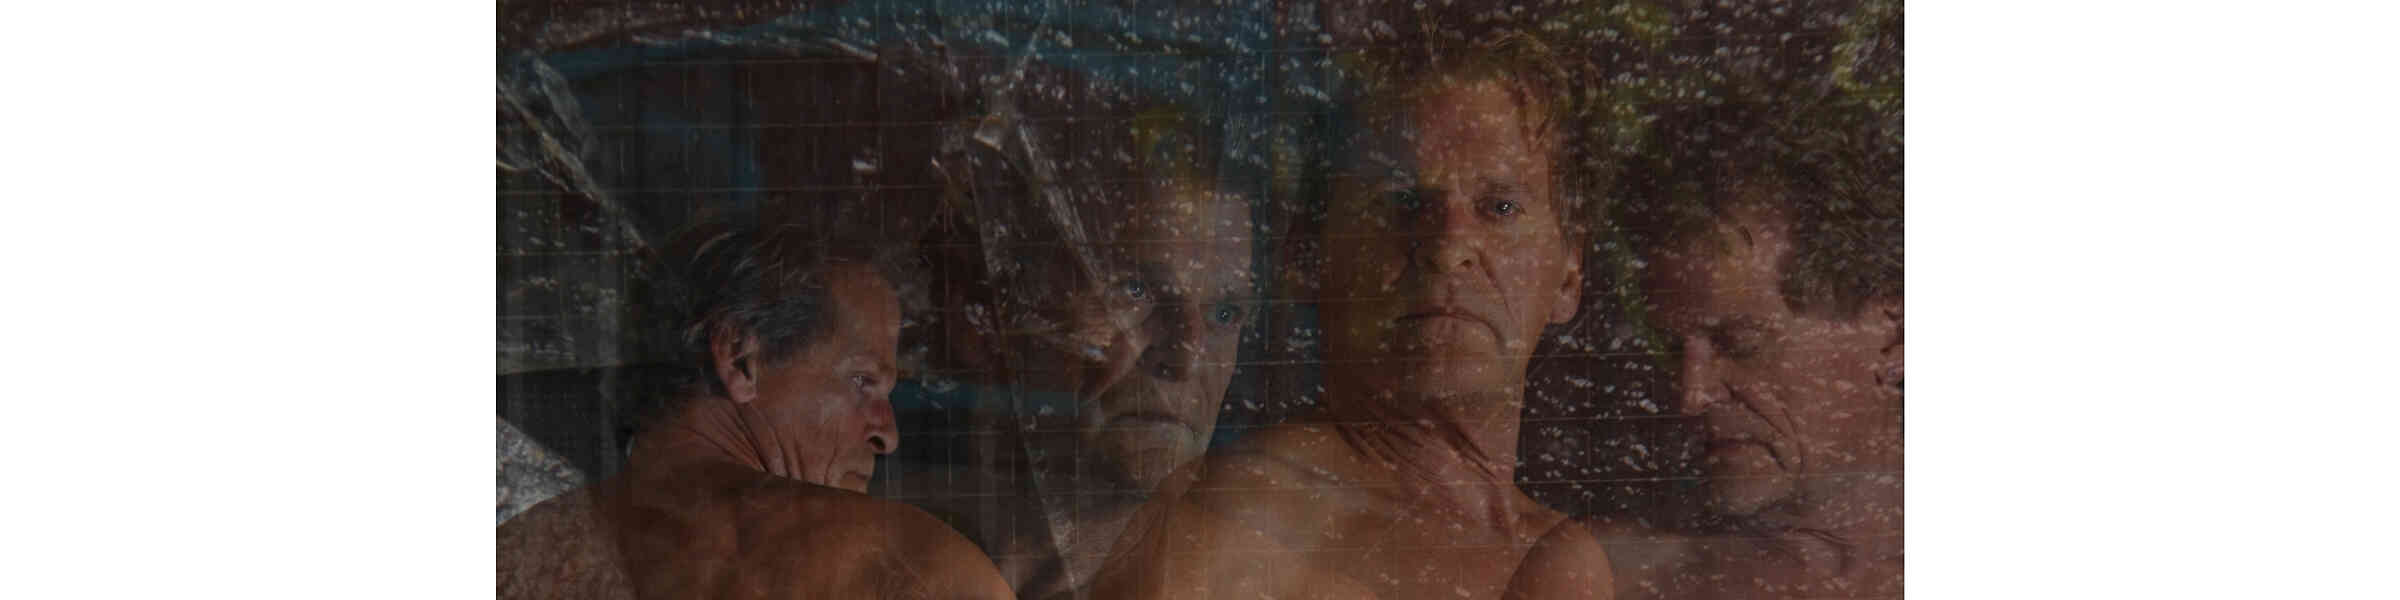 Barbara Tyson,Geoffrey Bayldon (1924?017) Hot nude Carol-Anne Day,Veronica Scott